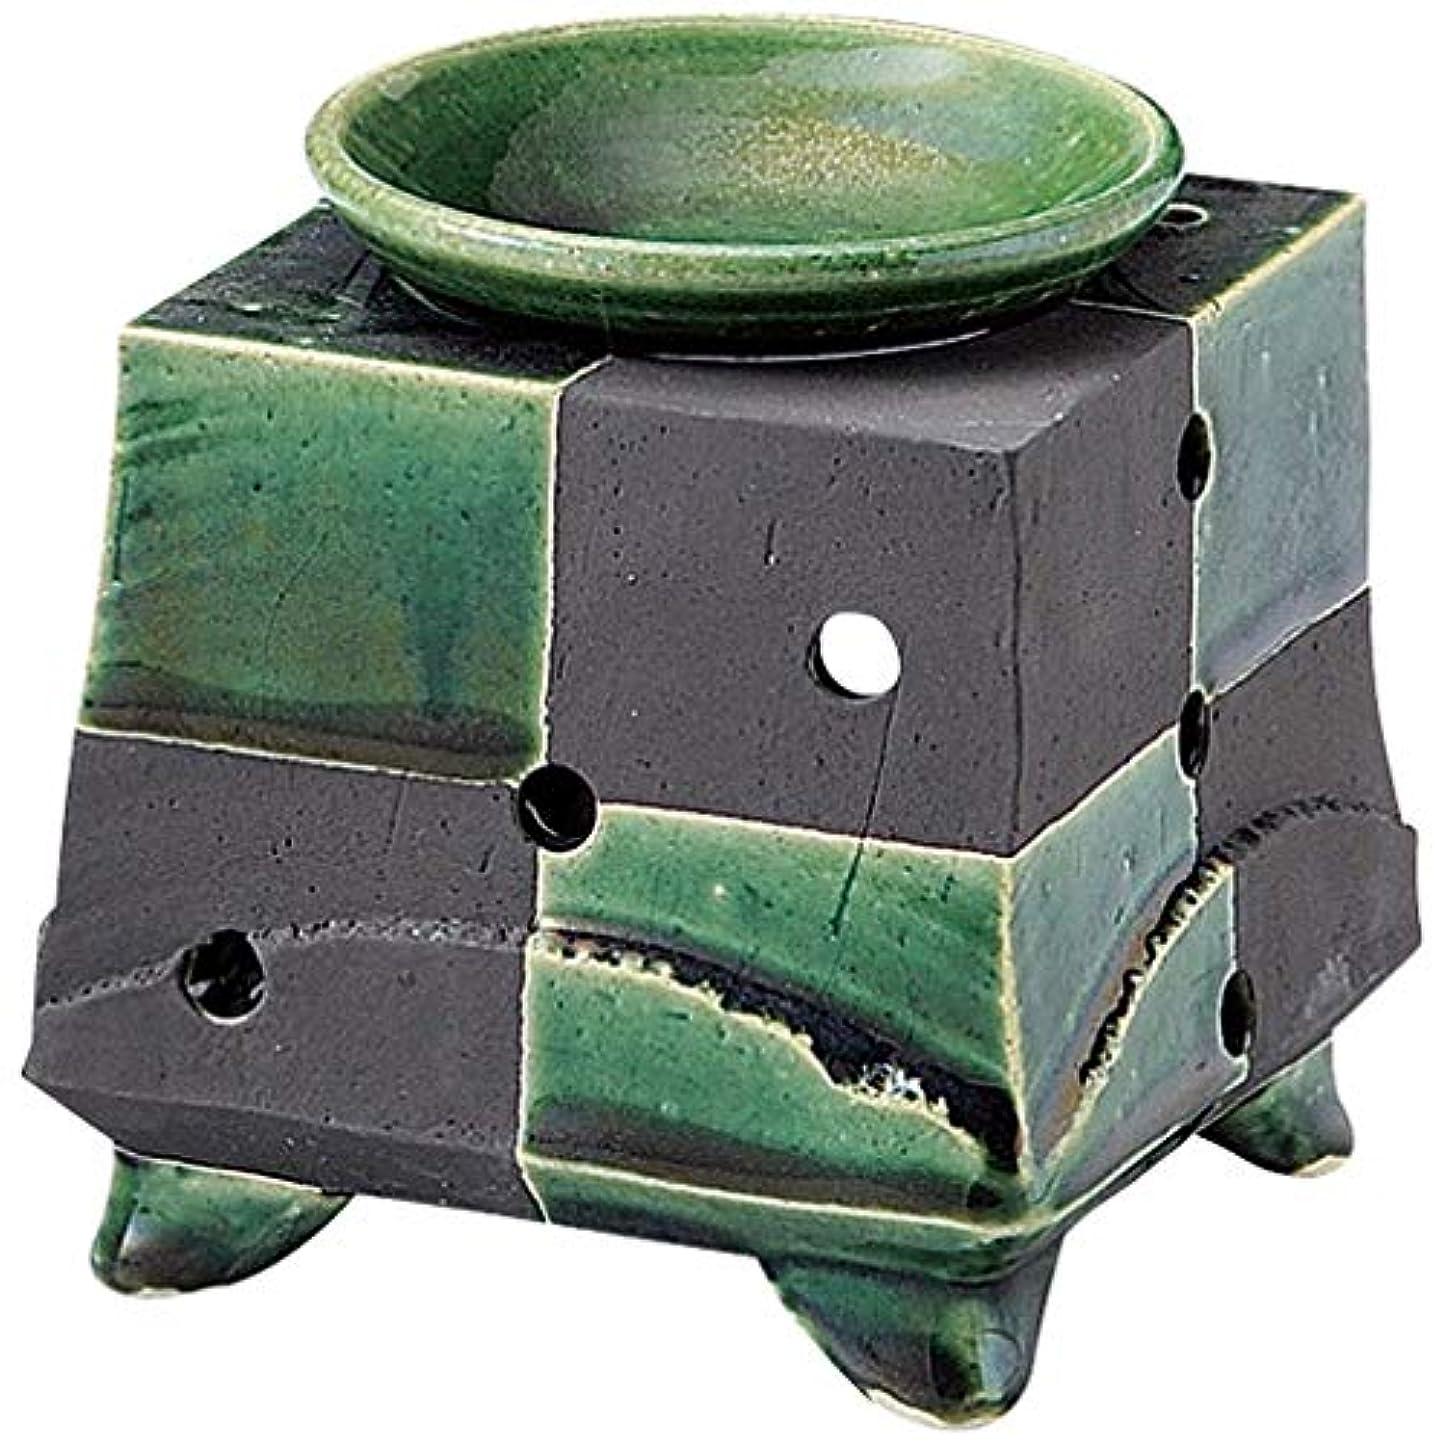 国民師匠平和な常滑焼 G1720 茶香炉  径11.5×11.5cm